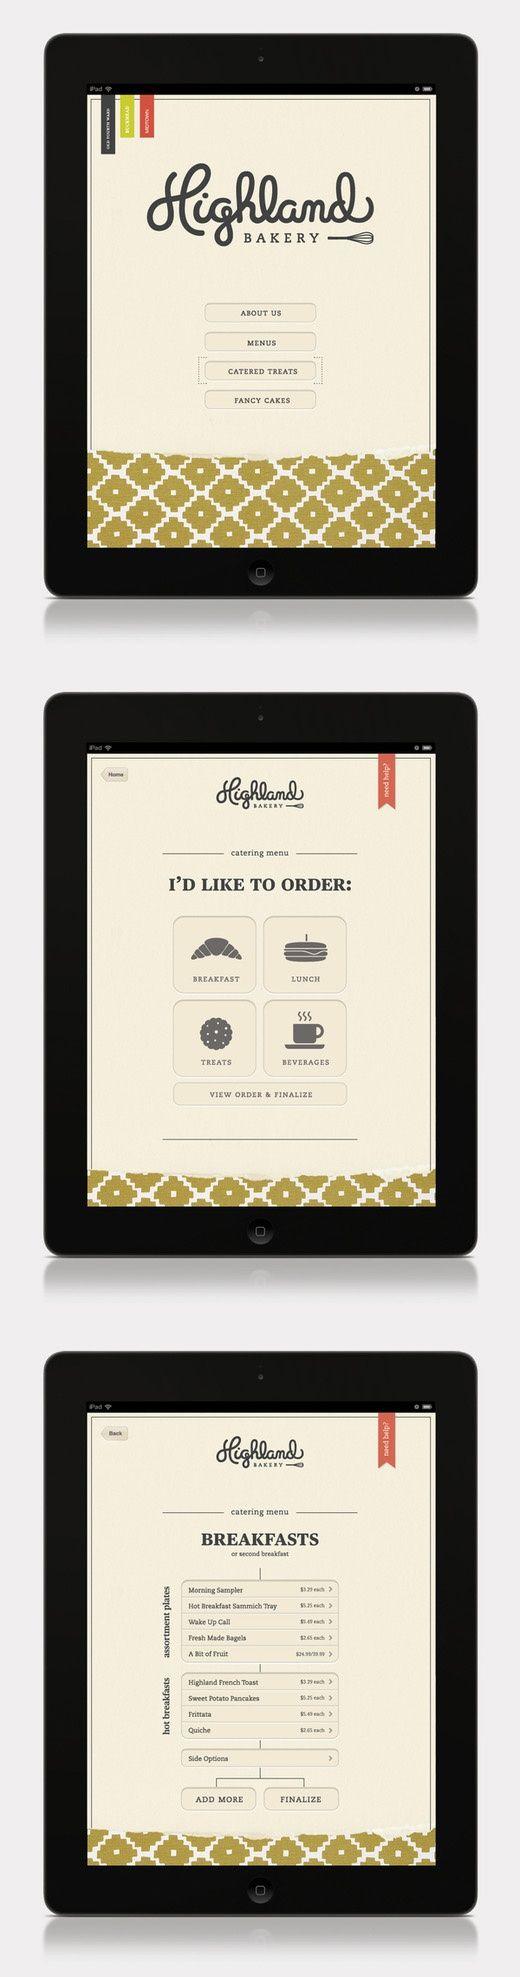 Highland Bakery App